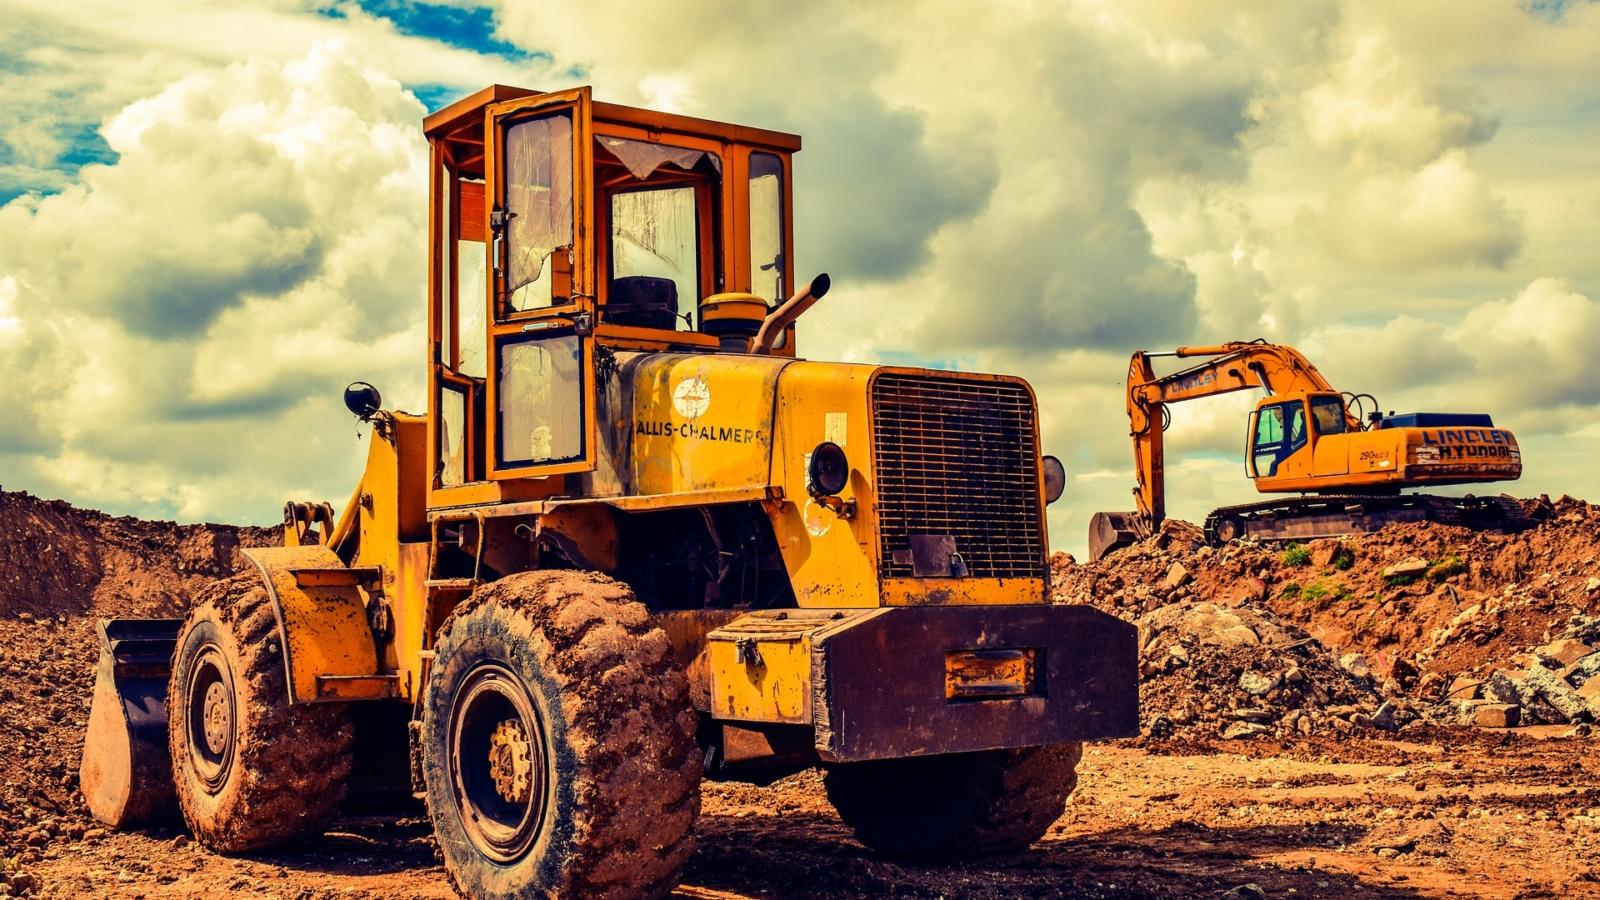 bulldozer-2195329_1920